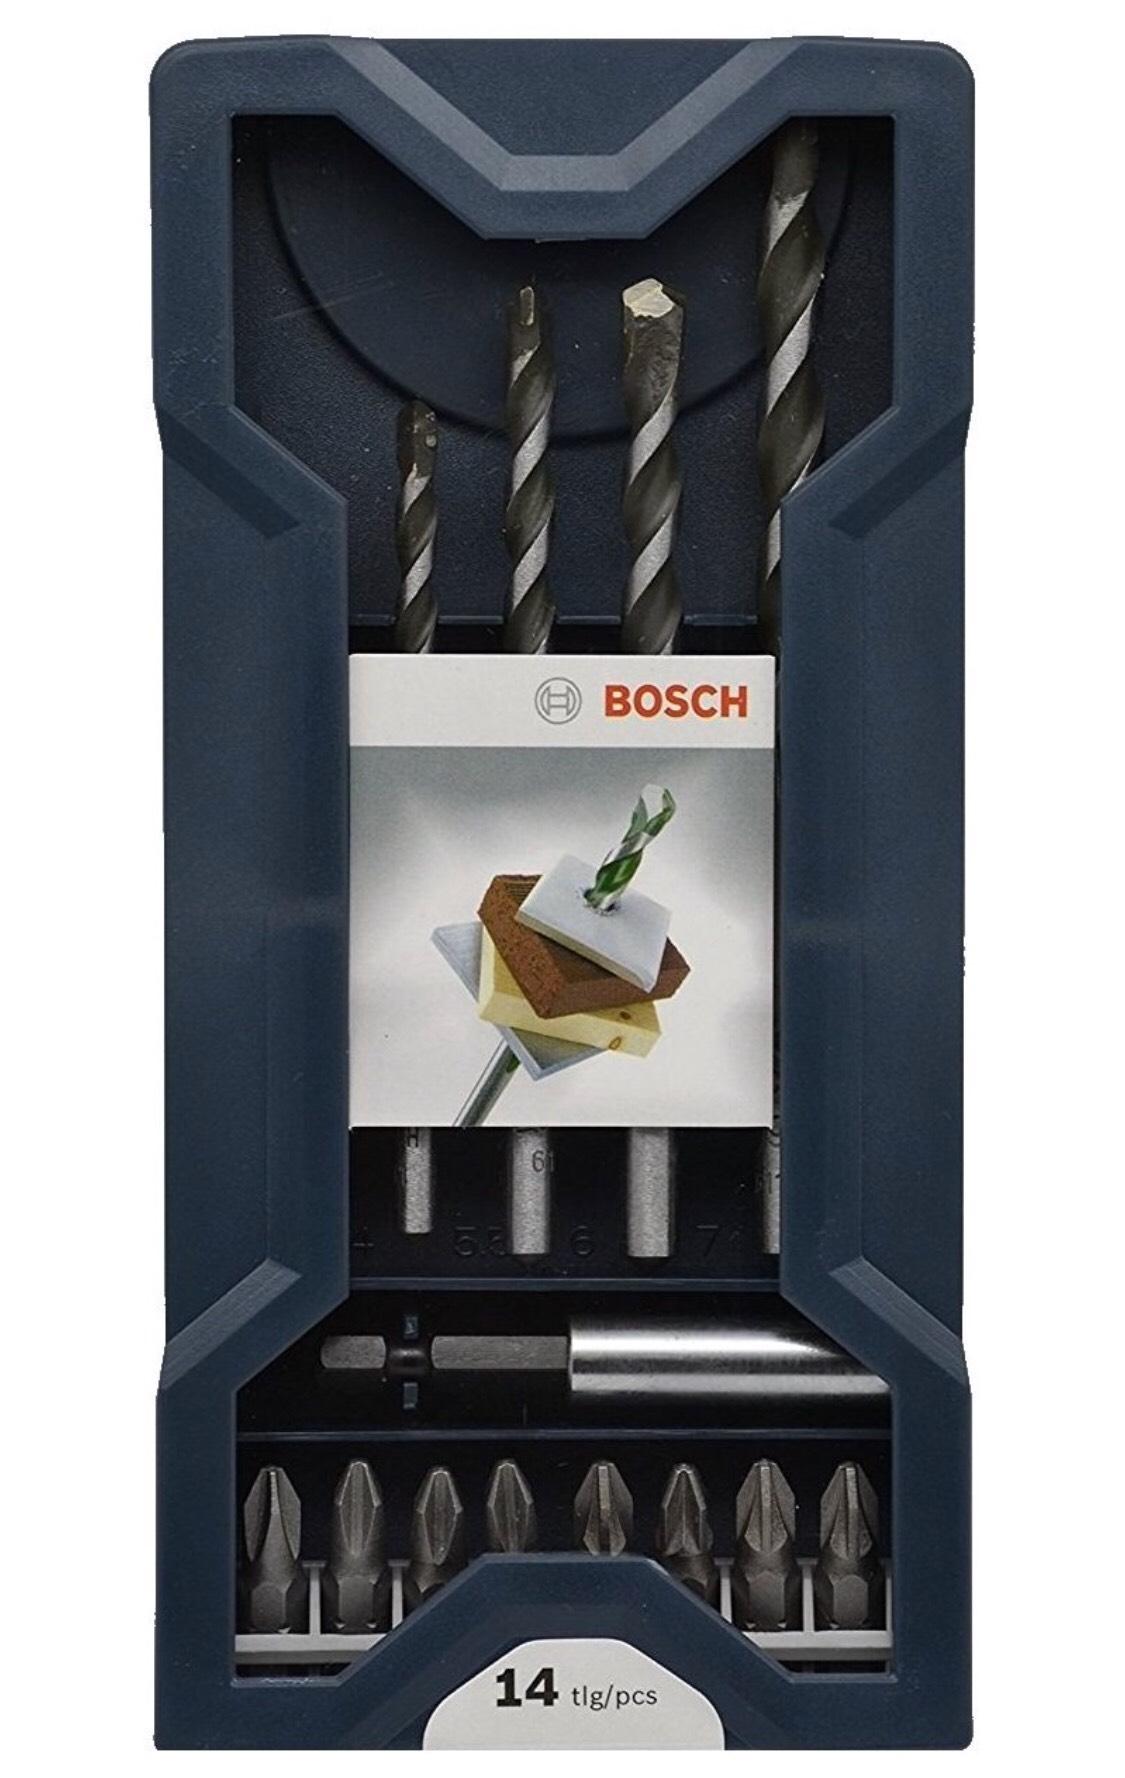 Bosch Professional Mehrzweckbohrer 14tlg DIY [Amazon Prime ]